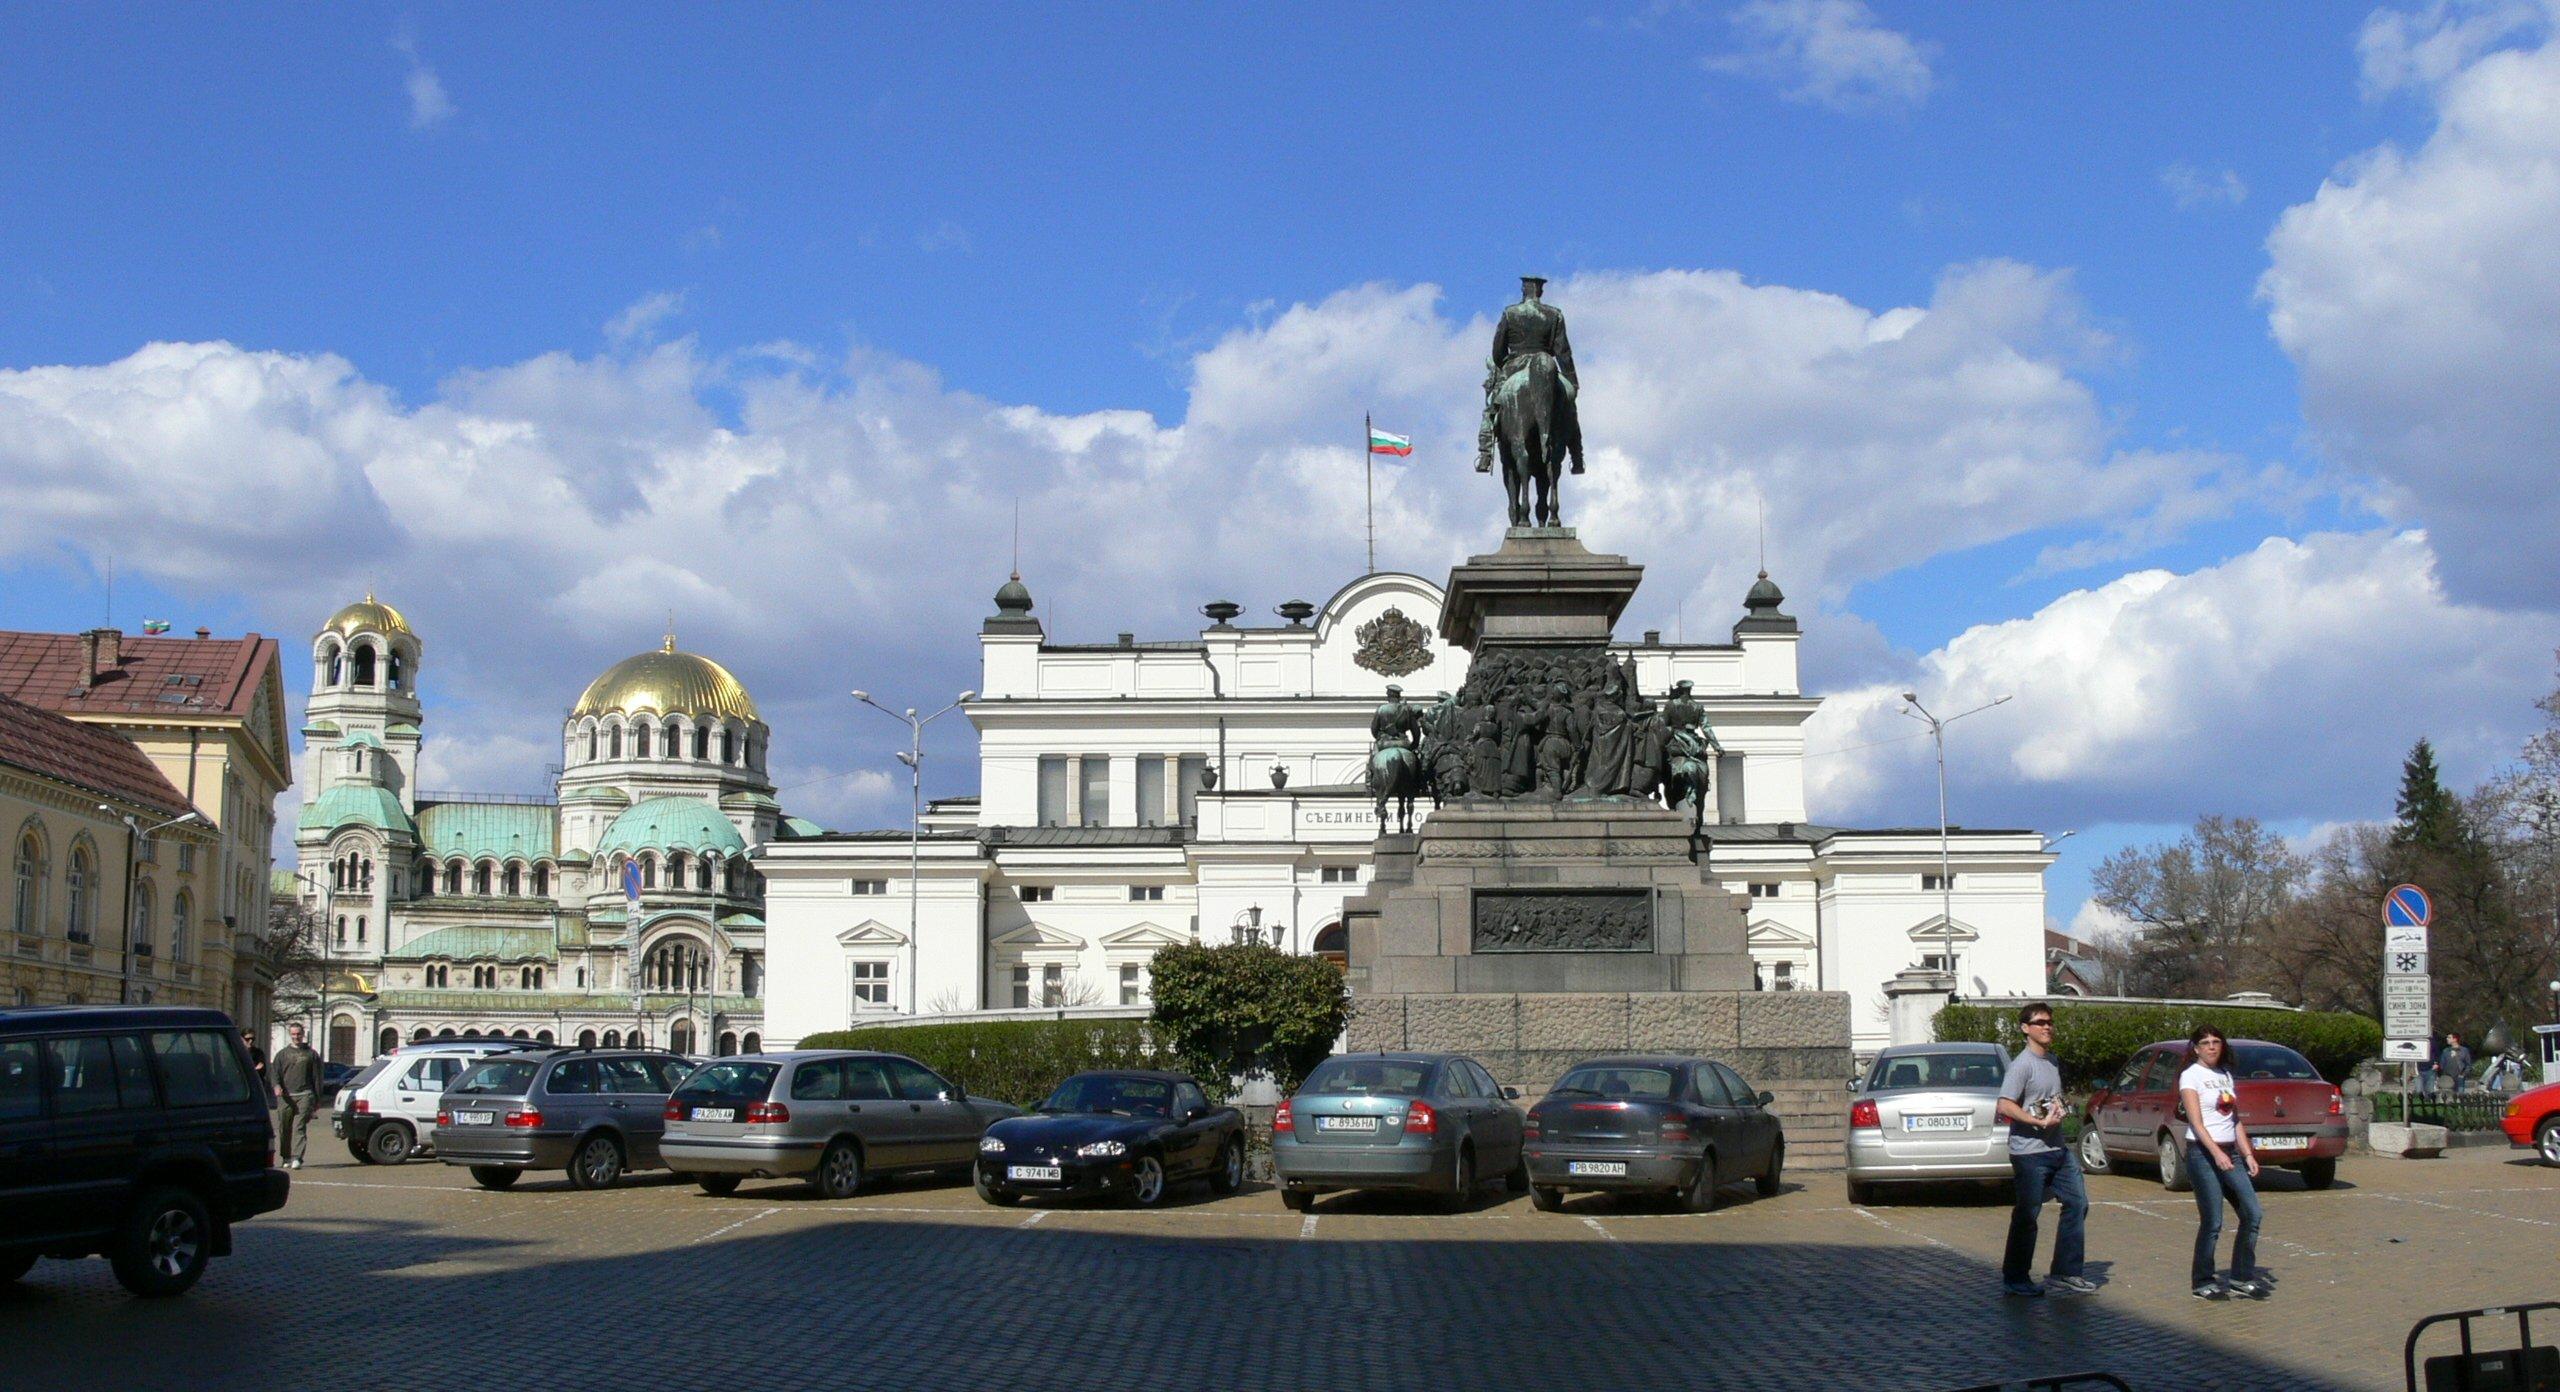 1-Sofia-parliament-square-ifb